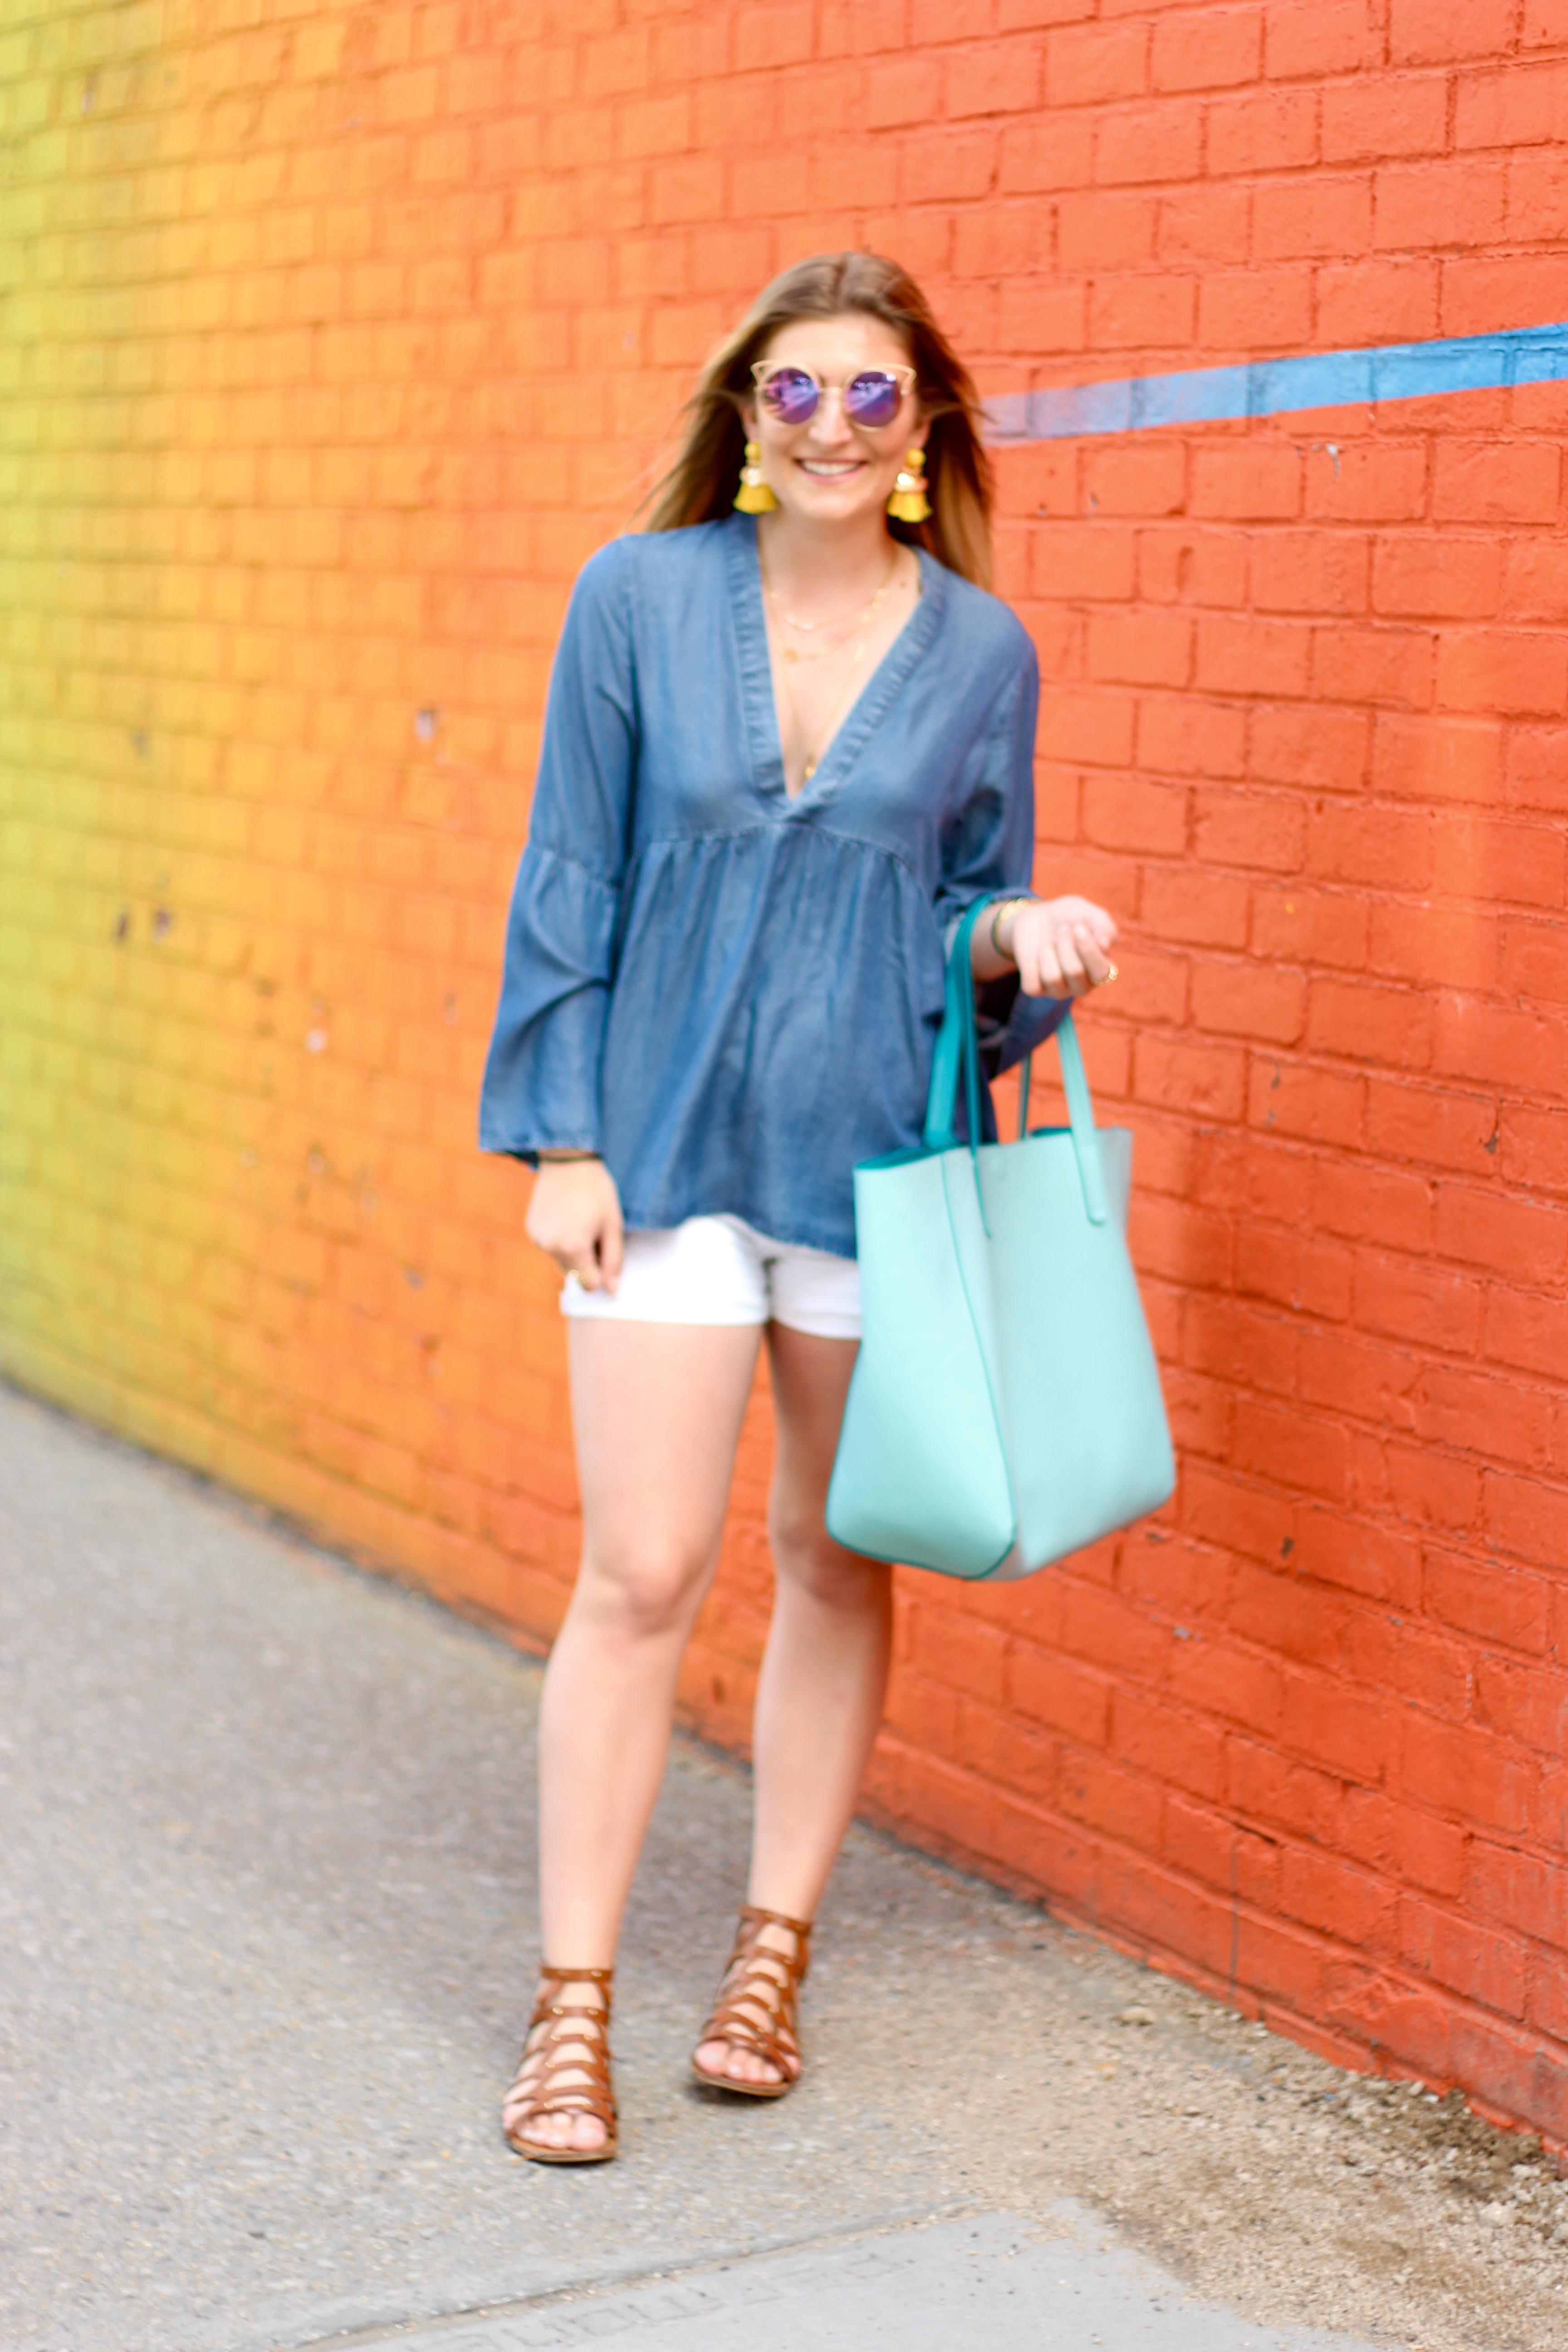 brooklyn dumbo wall fashion | Audrey Madison Stowe Blog - Rainbow Wall in Brooklyn by popular Texas travel blogger Audrey Madison Stowe